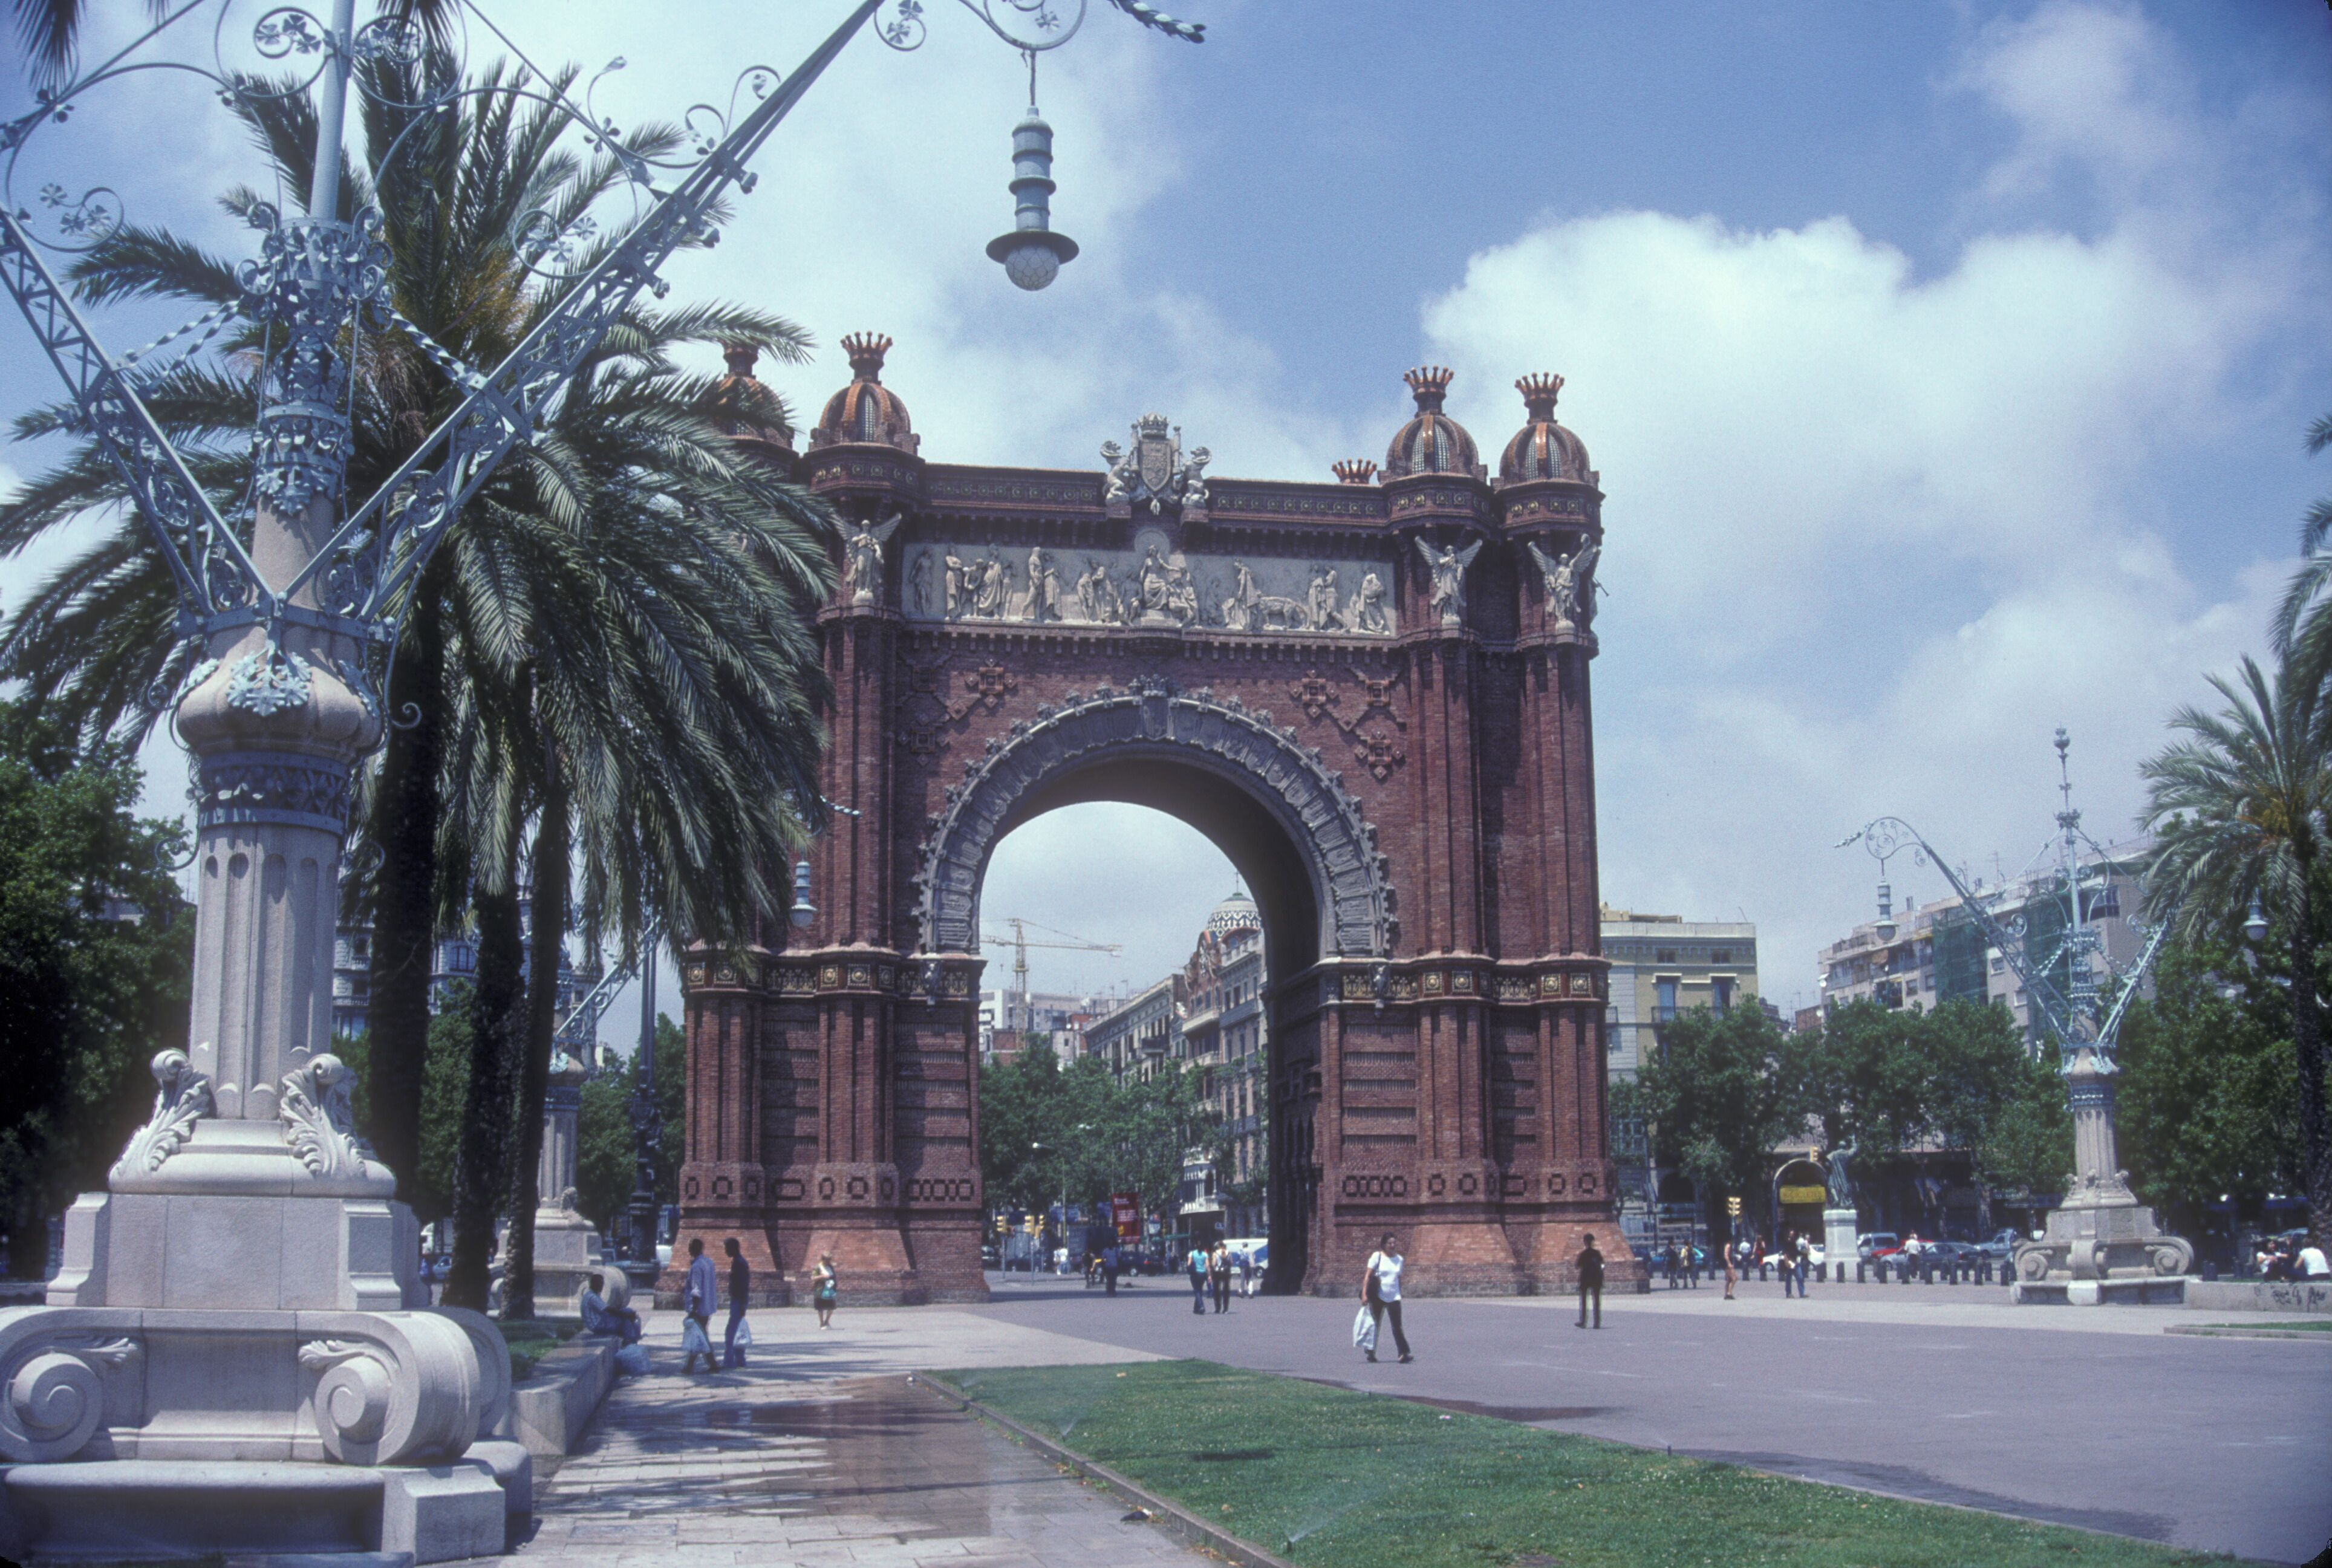 Arch in Barcelona, Spain